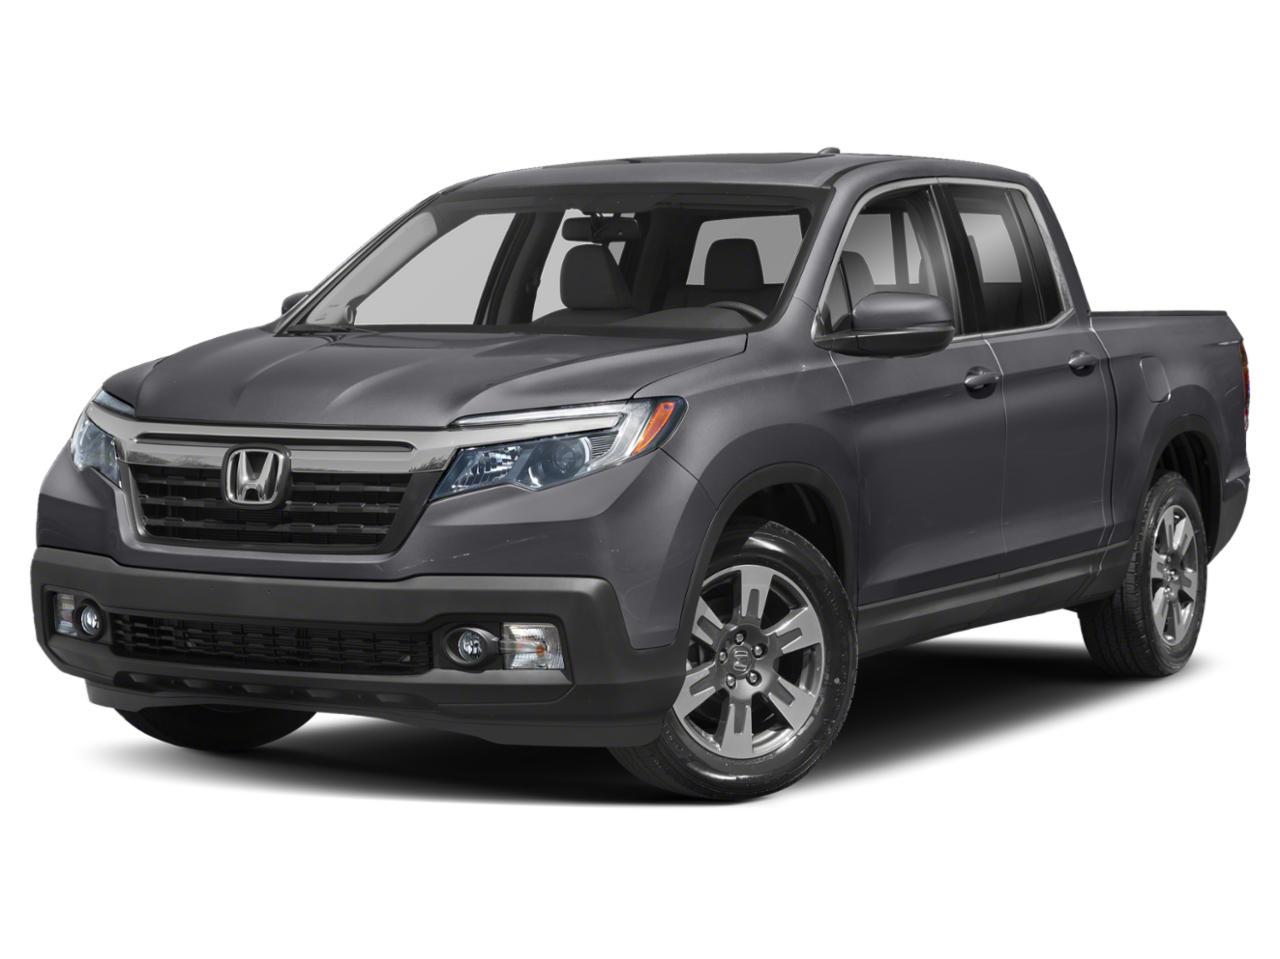 2019 Honda Ridgeline Vehicle Photo in San Antonio, TX 78238